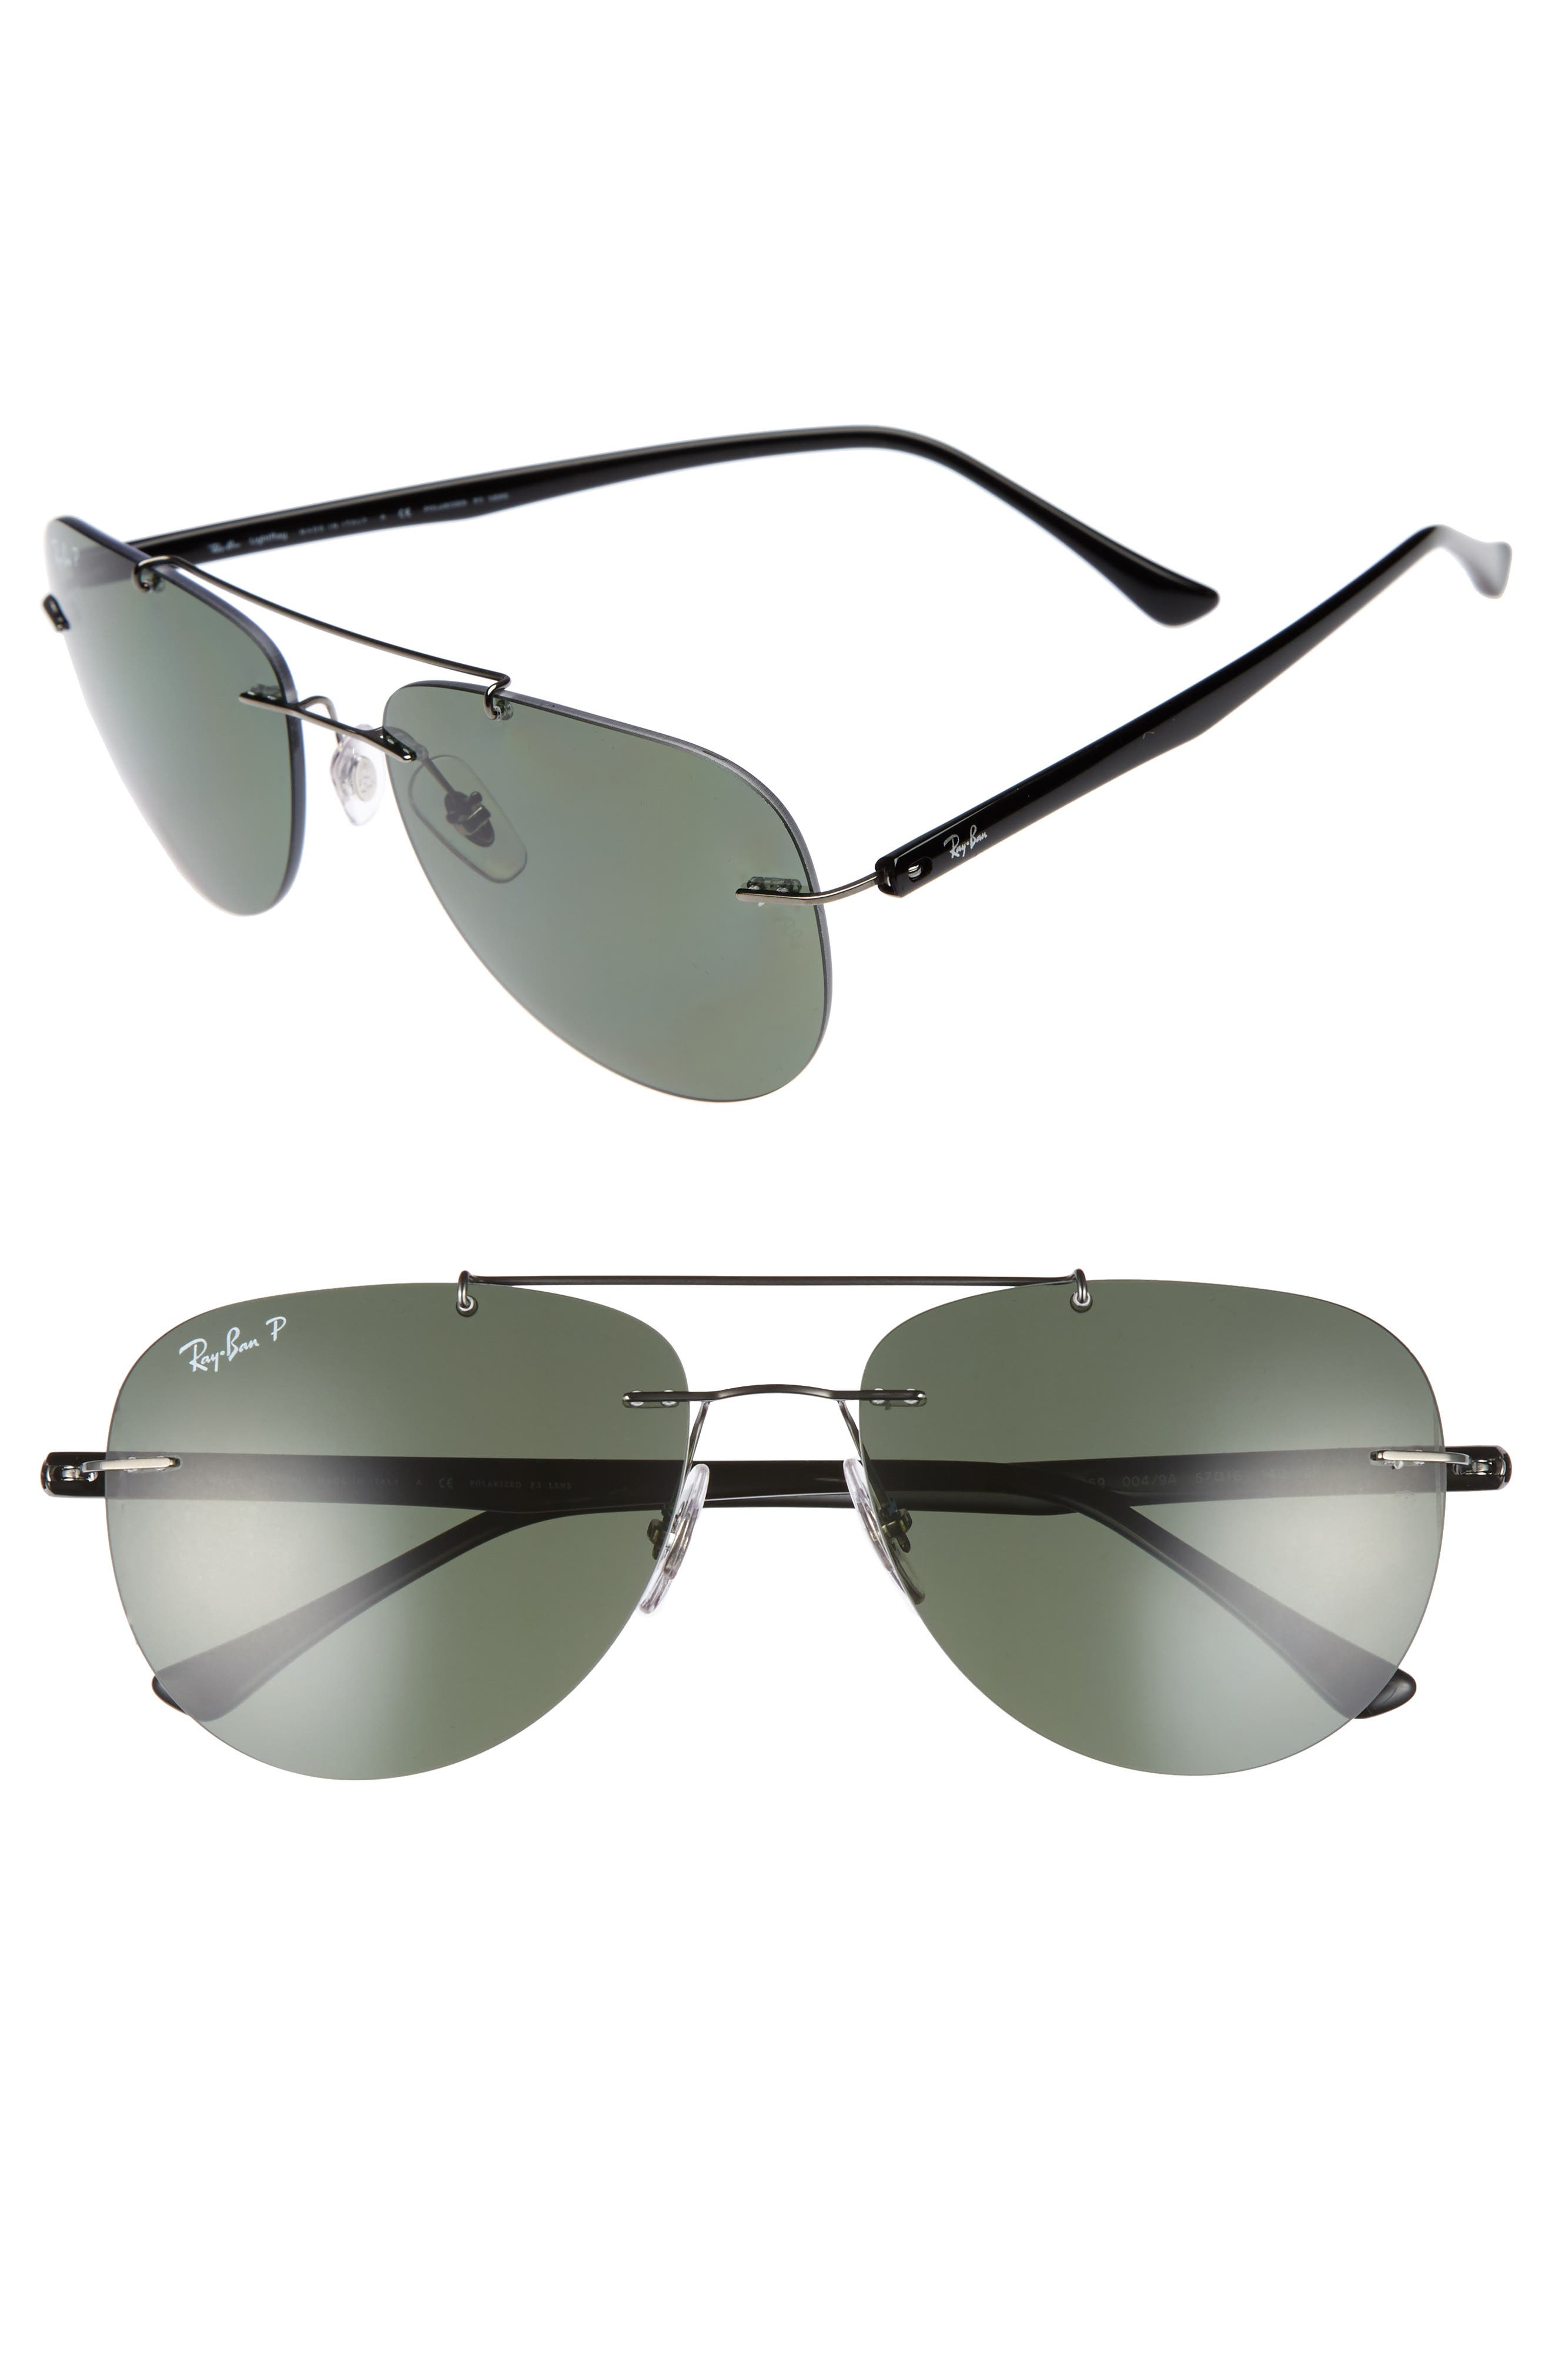 Ray-Ban Phantos 57mm Polarized Rimless Aviator Sunglasses